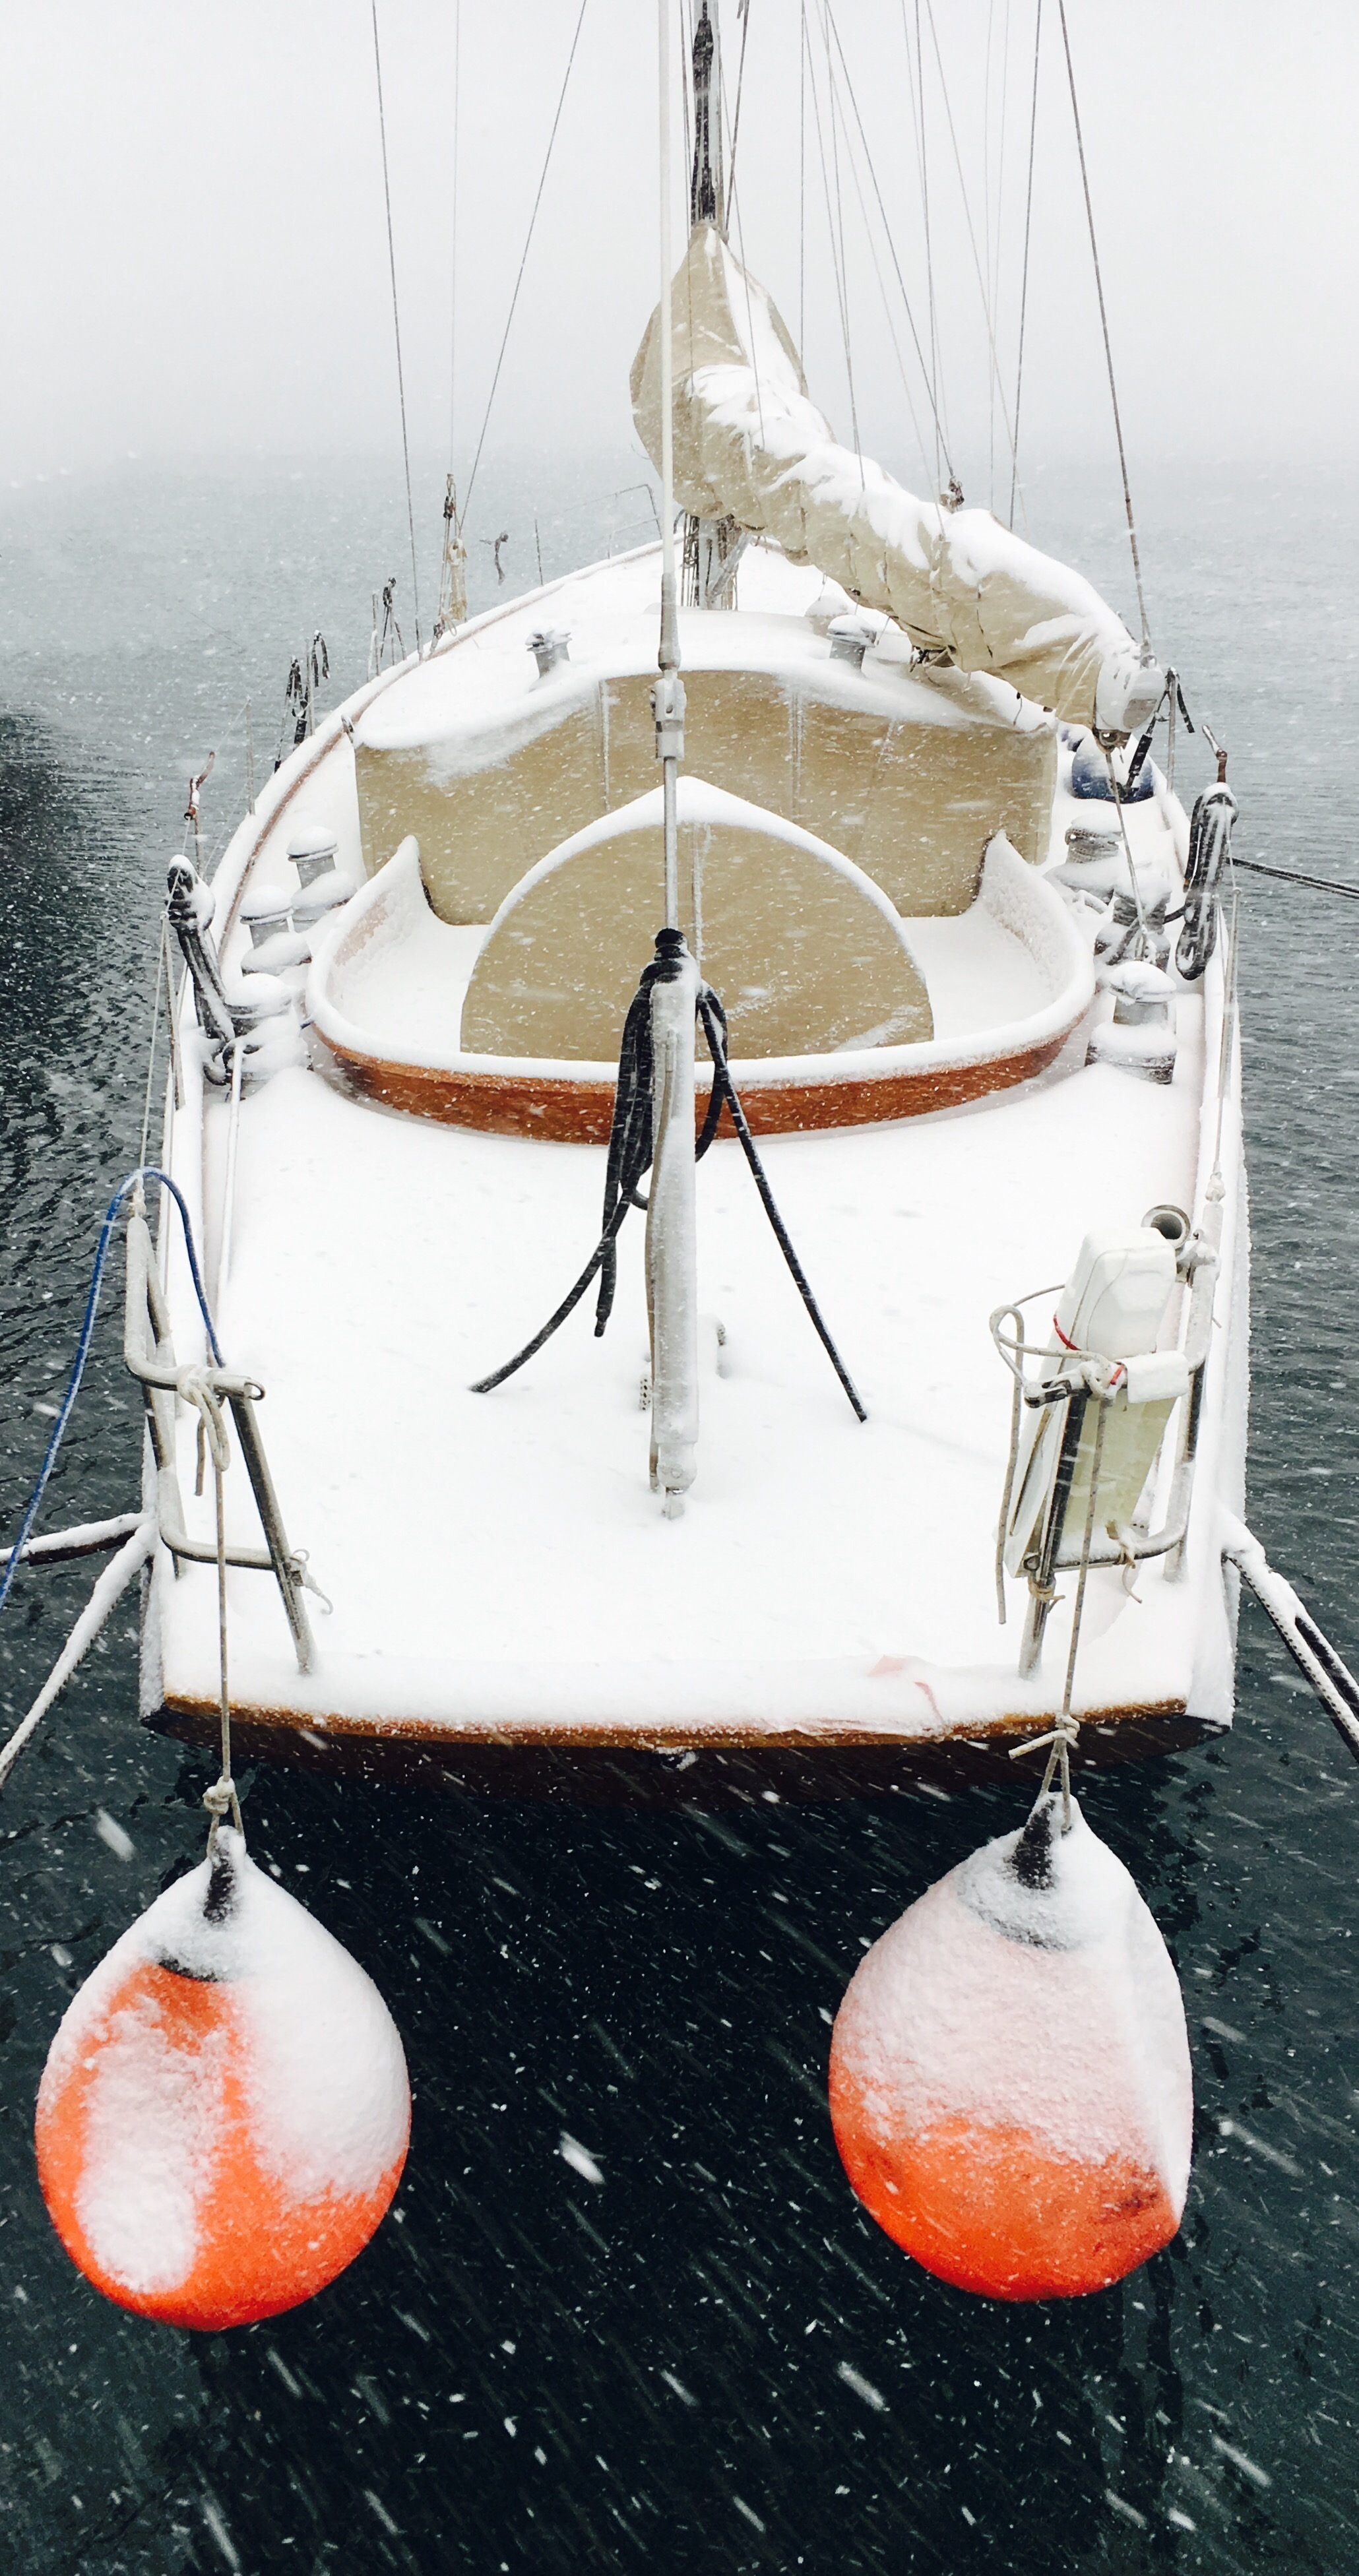 Winter edition of a wonderful  Spirit  yacht.